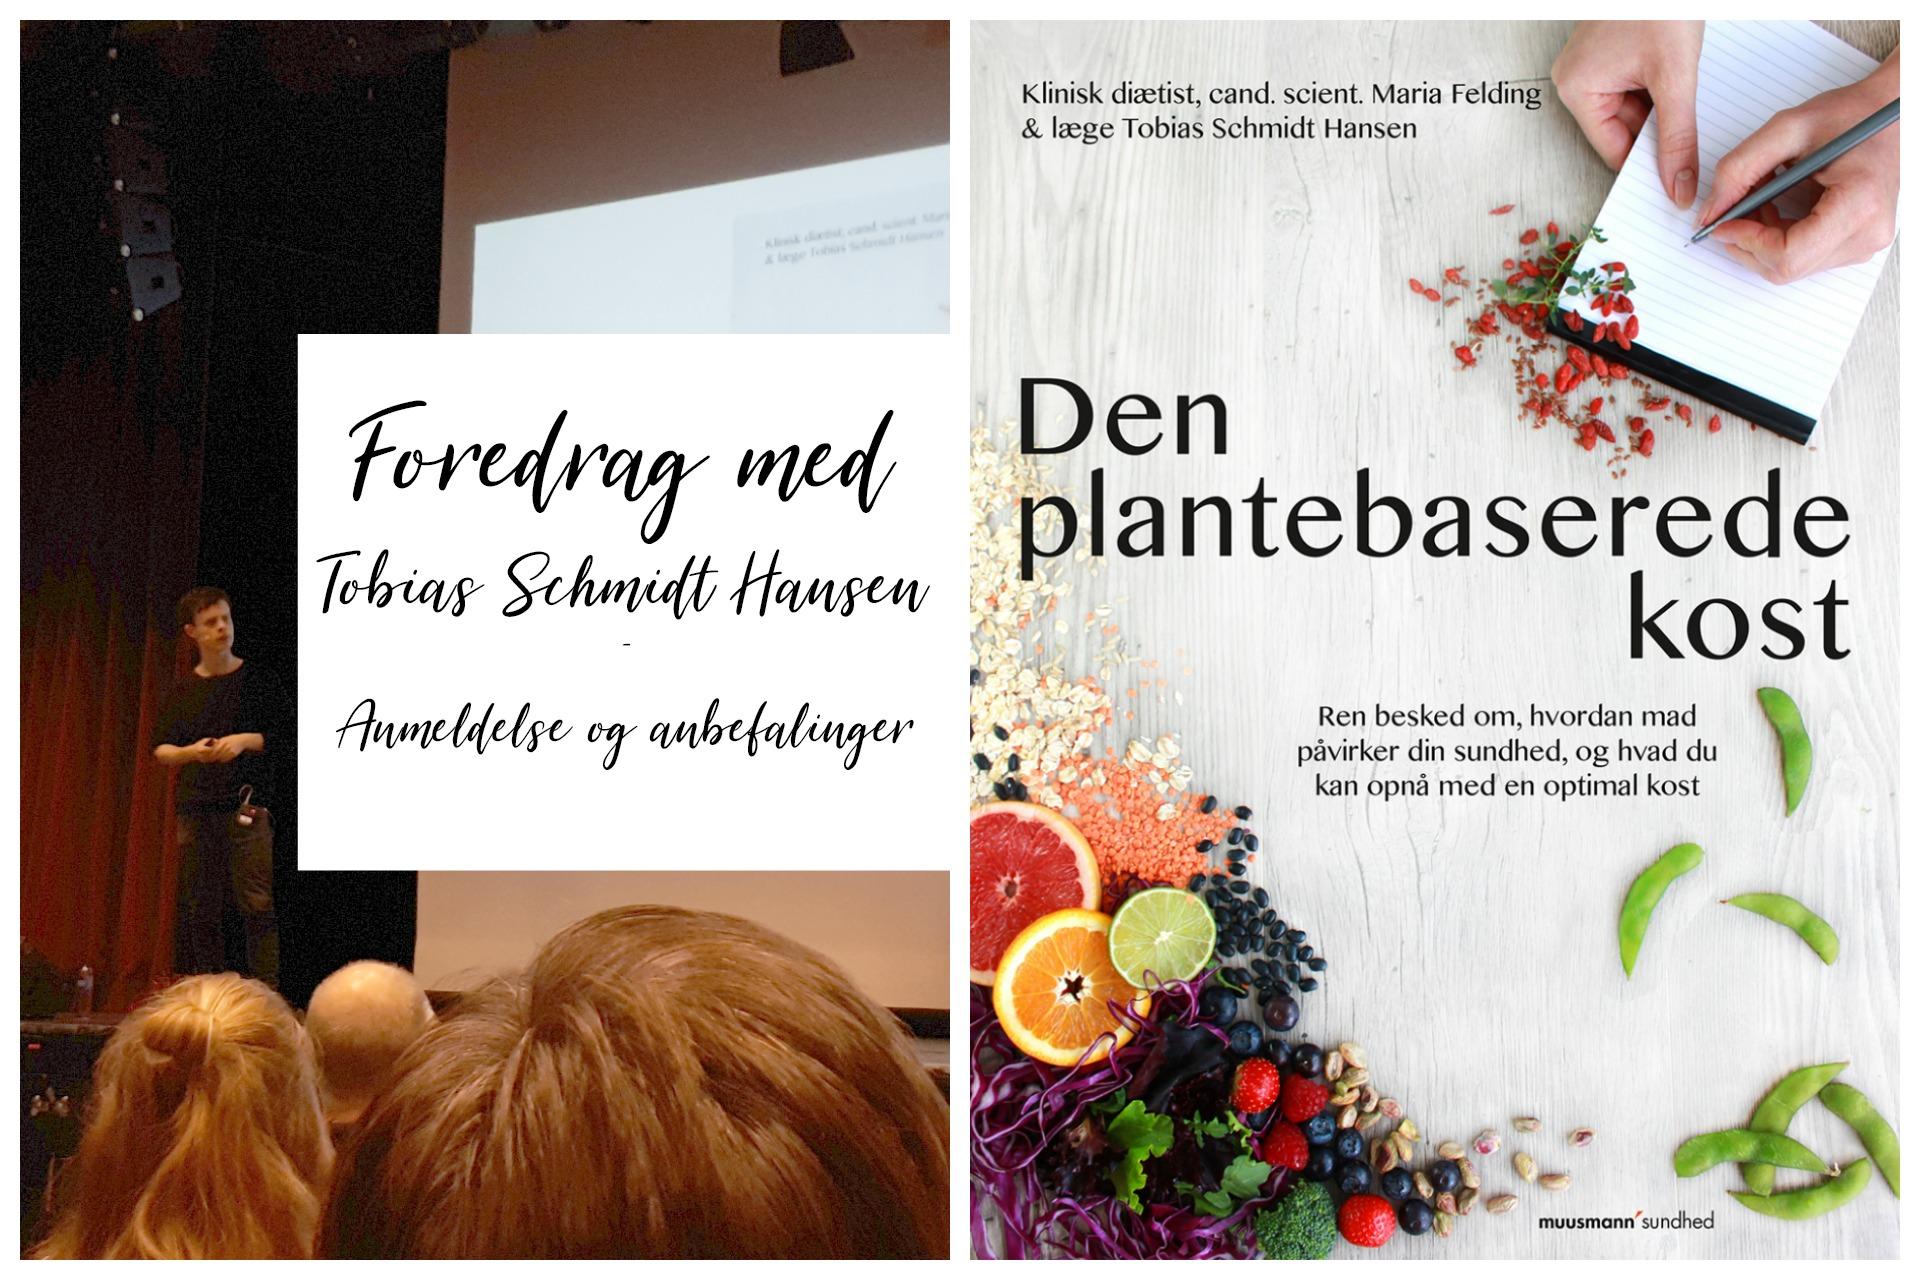 den-plantebaserede-kost-foredrag-med-tobias-schmidt-hansen